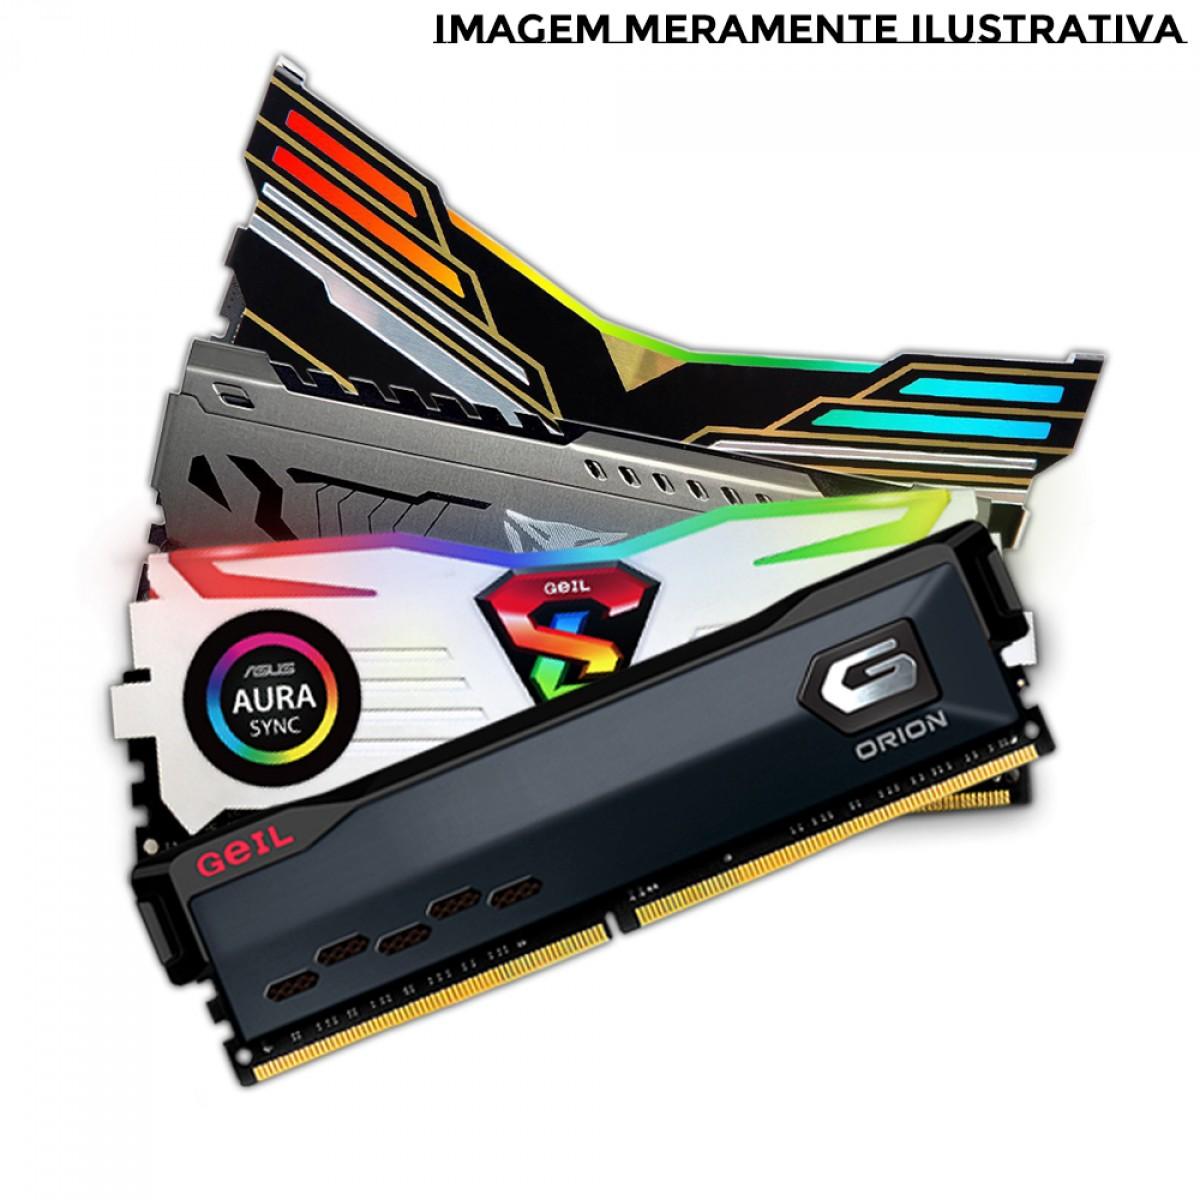 Kit Upgrade, AMD Ryzen 5 3400G, Asus Prime A320M-K, Memória DDR4 8GB 3000MHz